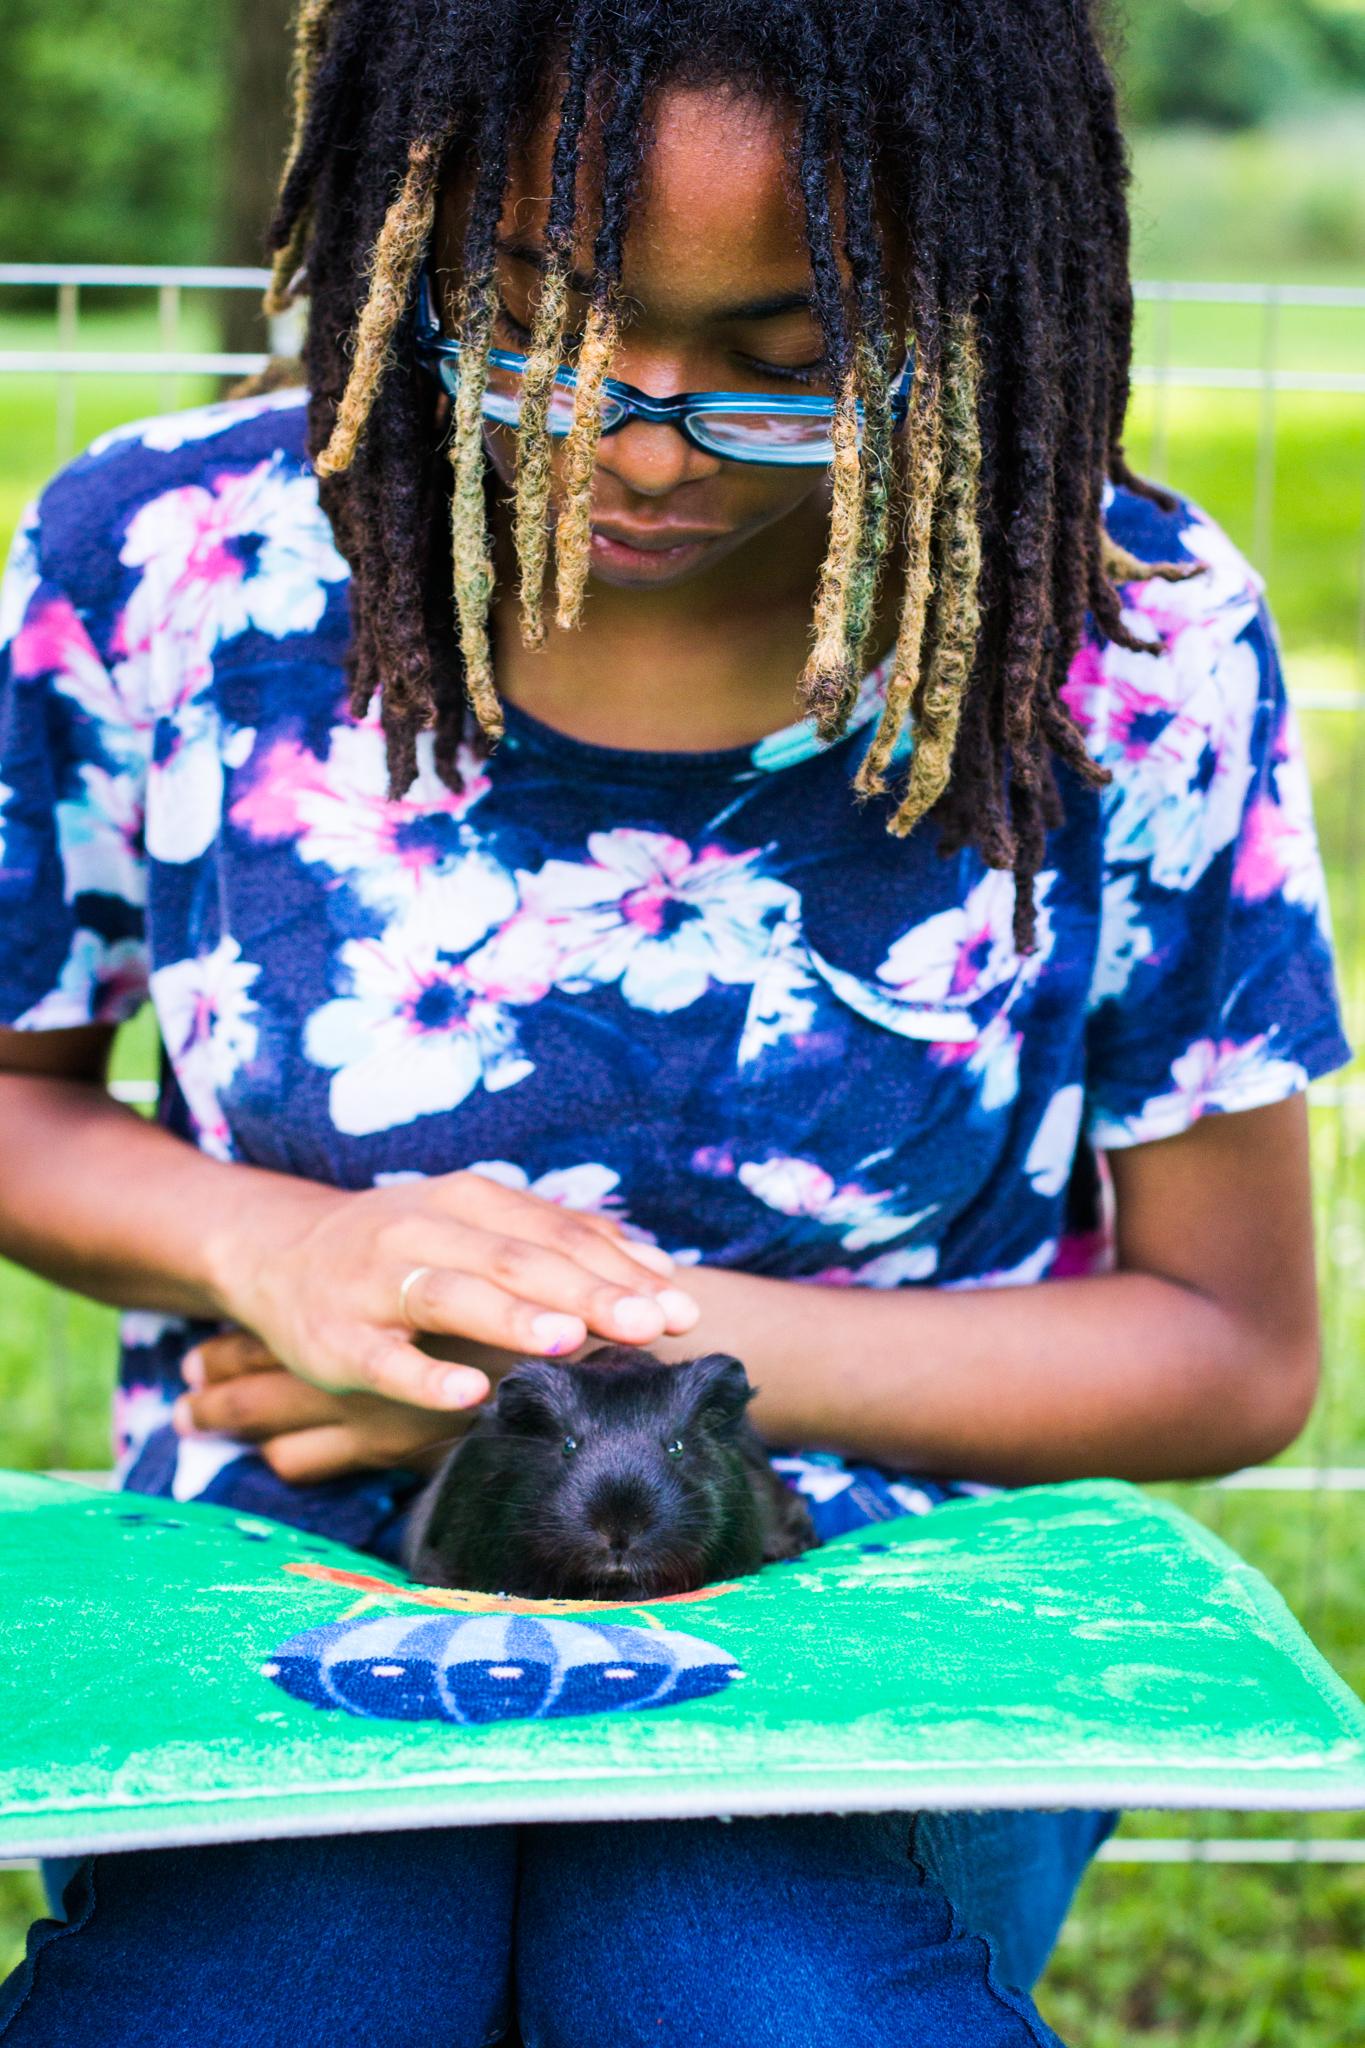 teen-birthday-petting-zoo.jpg